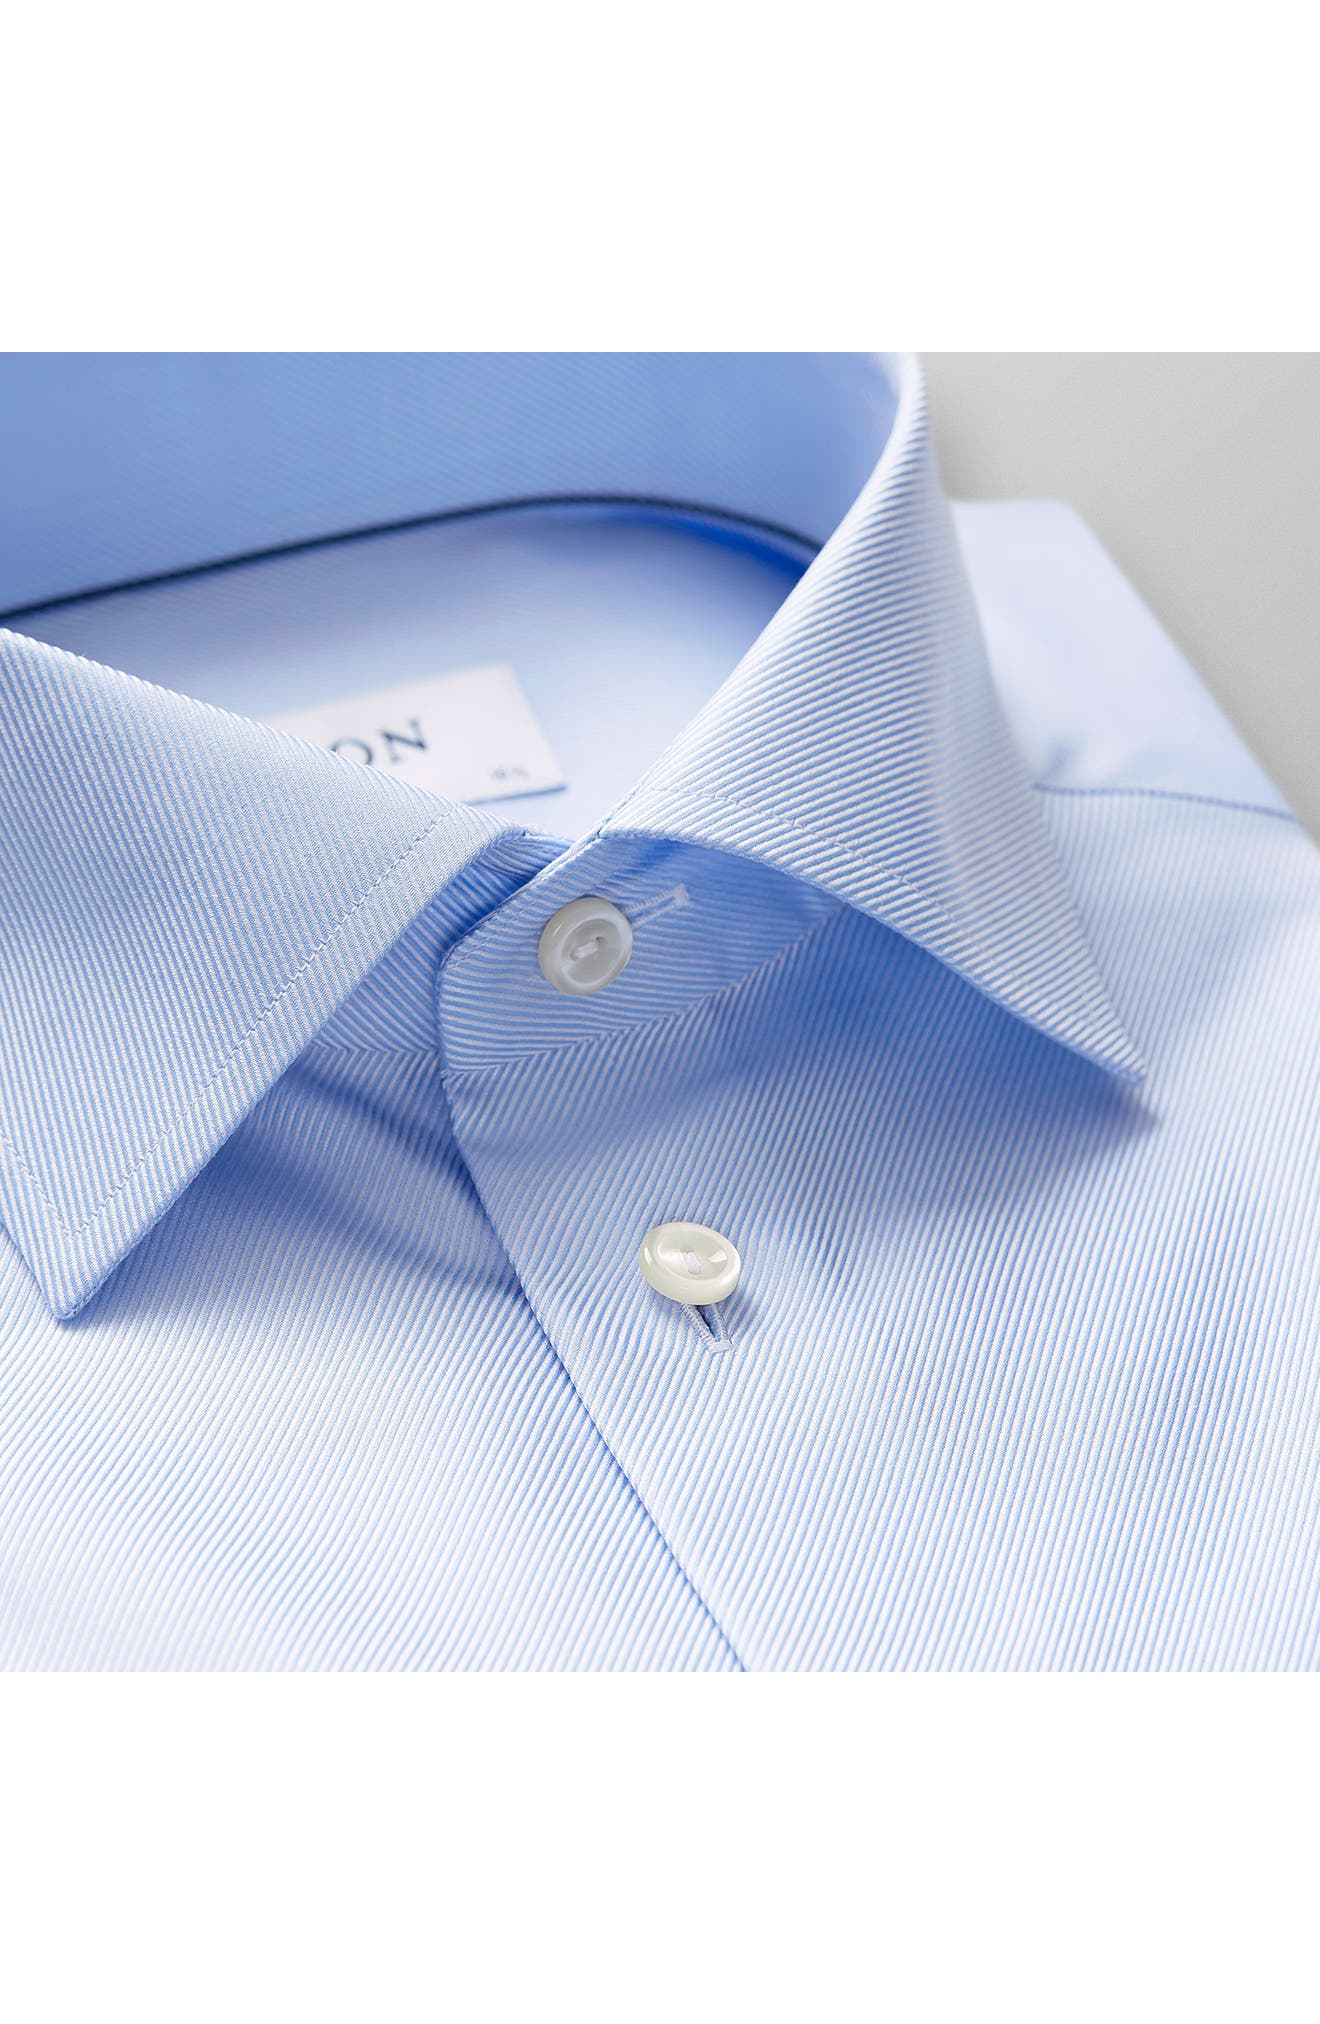 Slim Fit Non-Iron Dress Shirt,                         Main,                         color, LIGHT BLUE